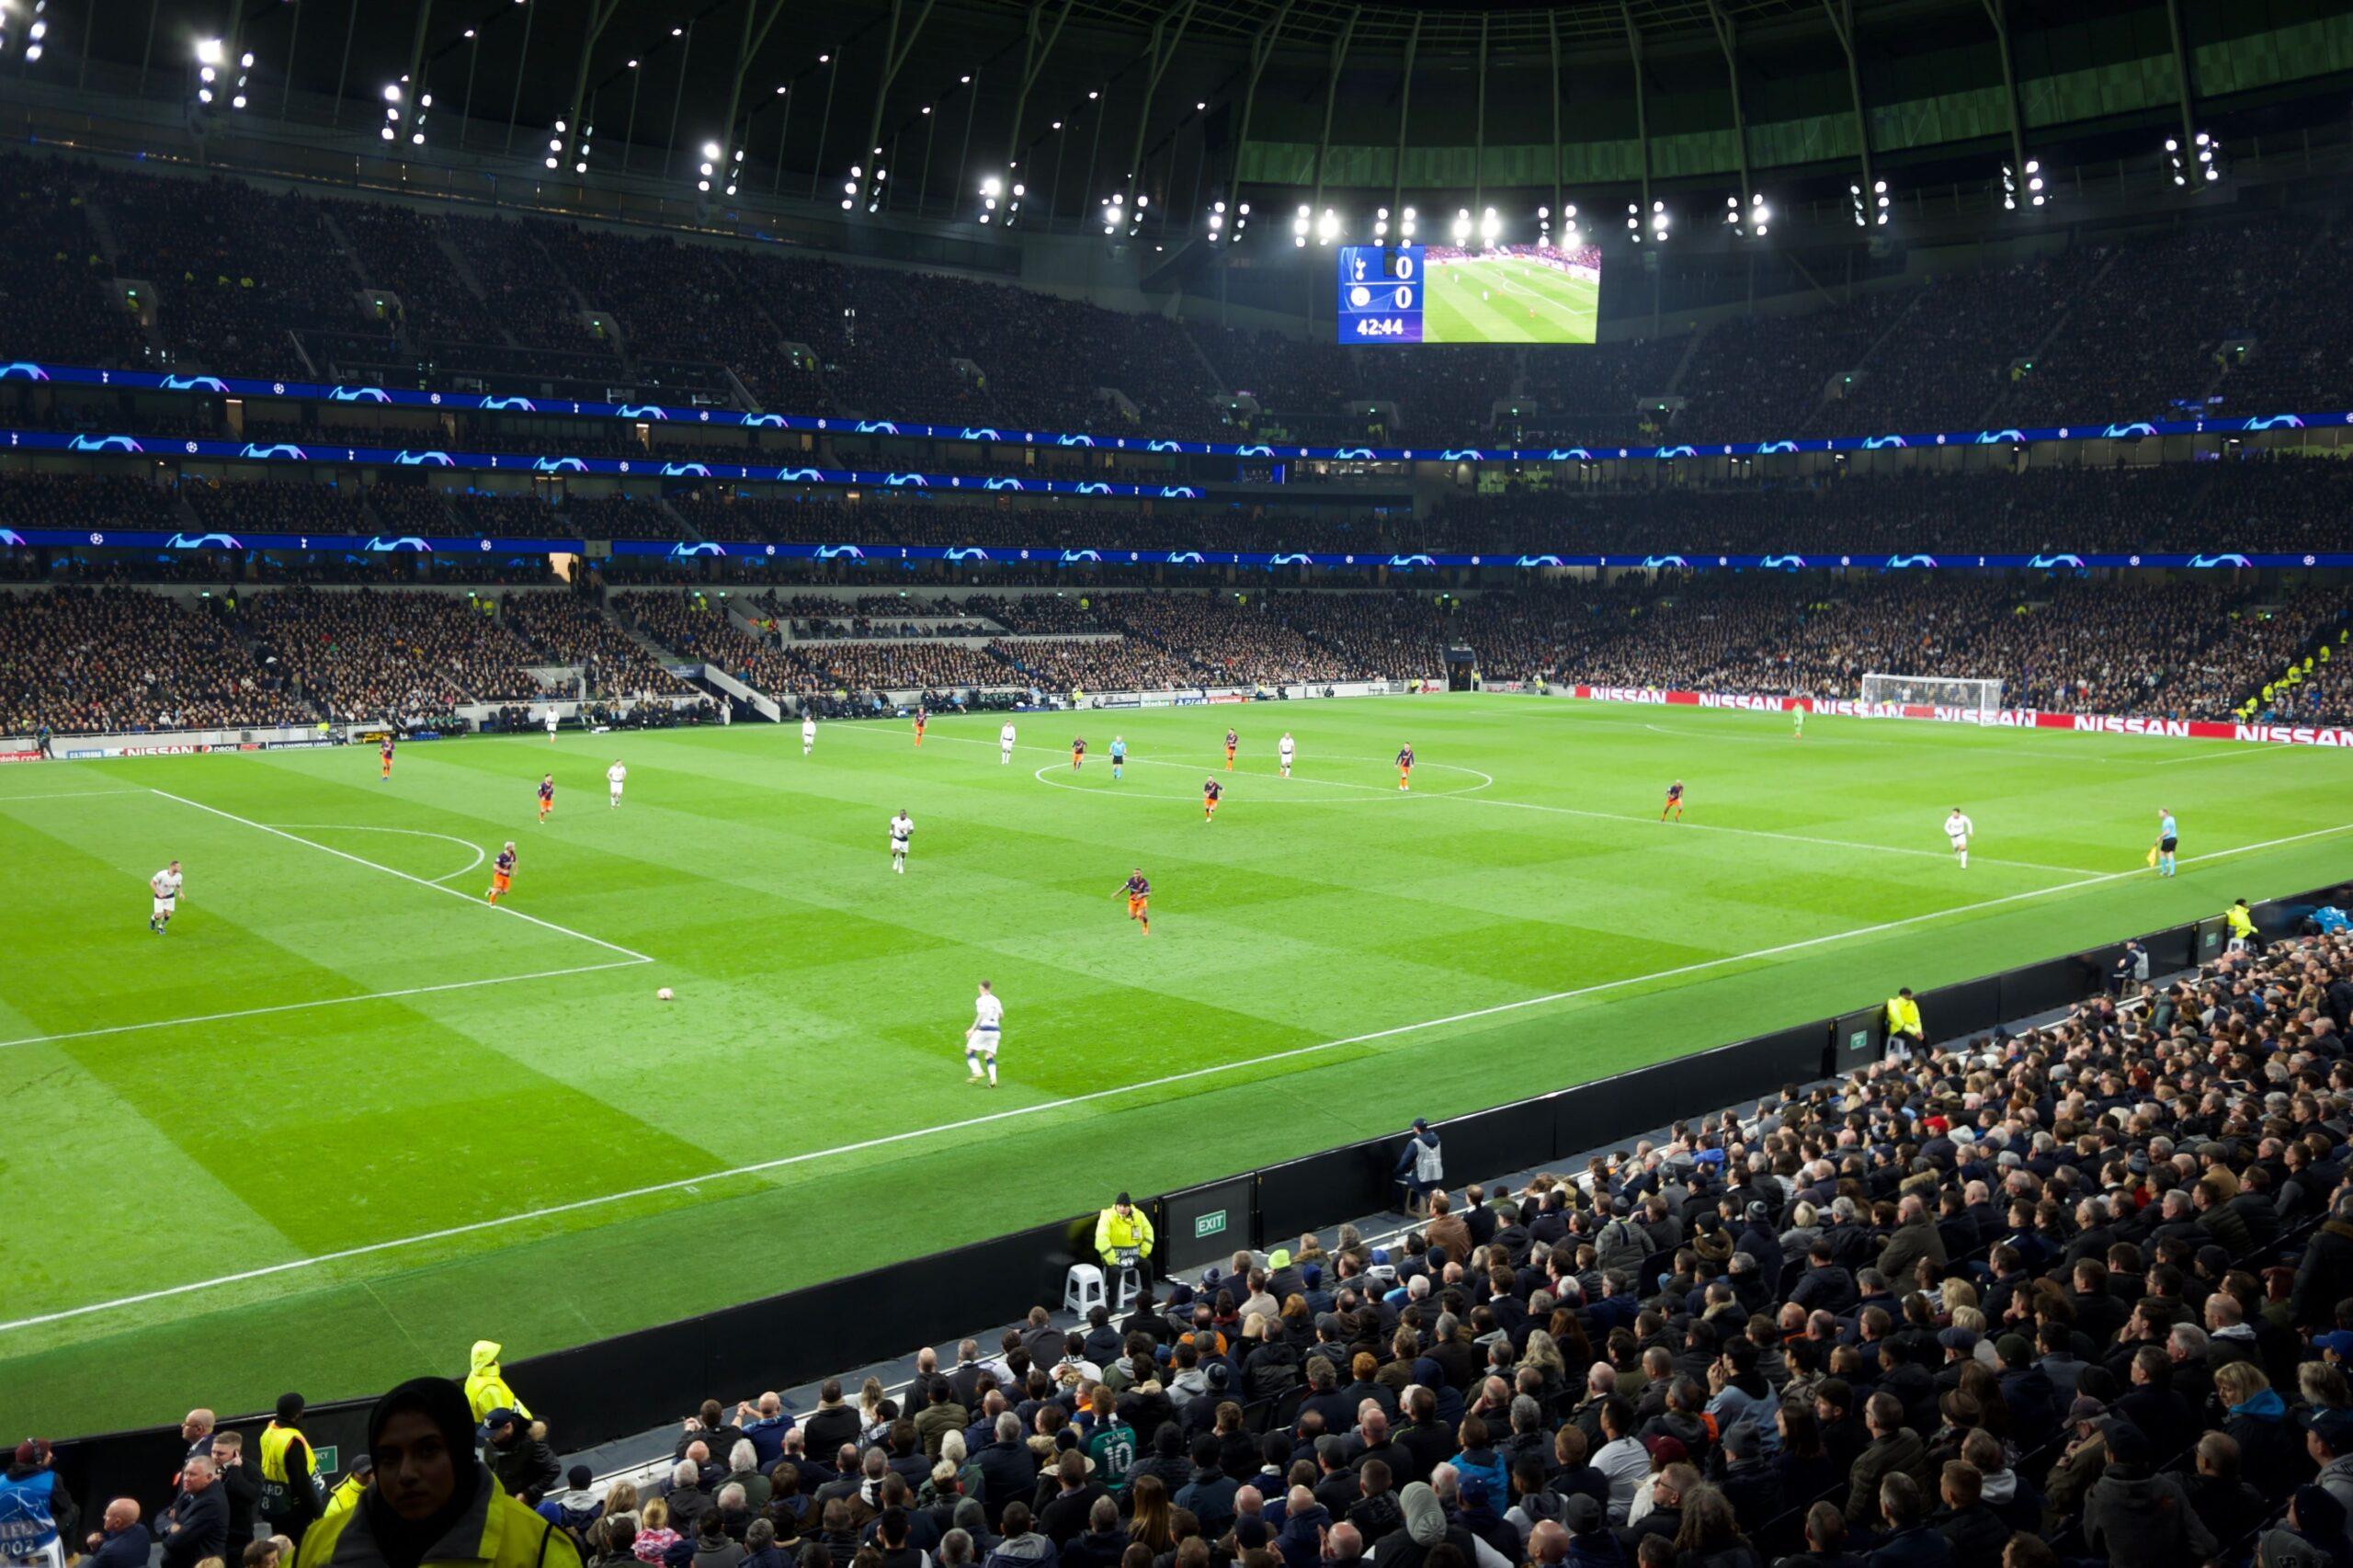 ¿Es rentable la Superliga Europea?